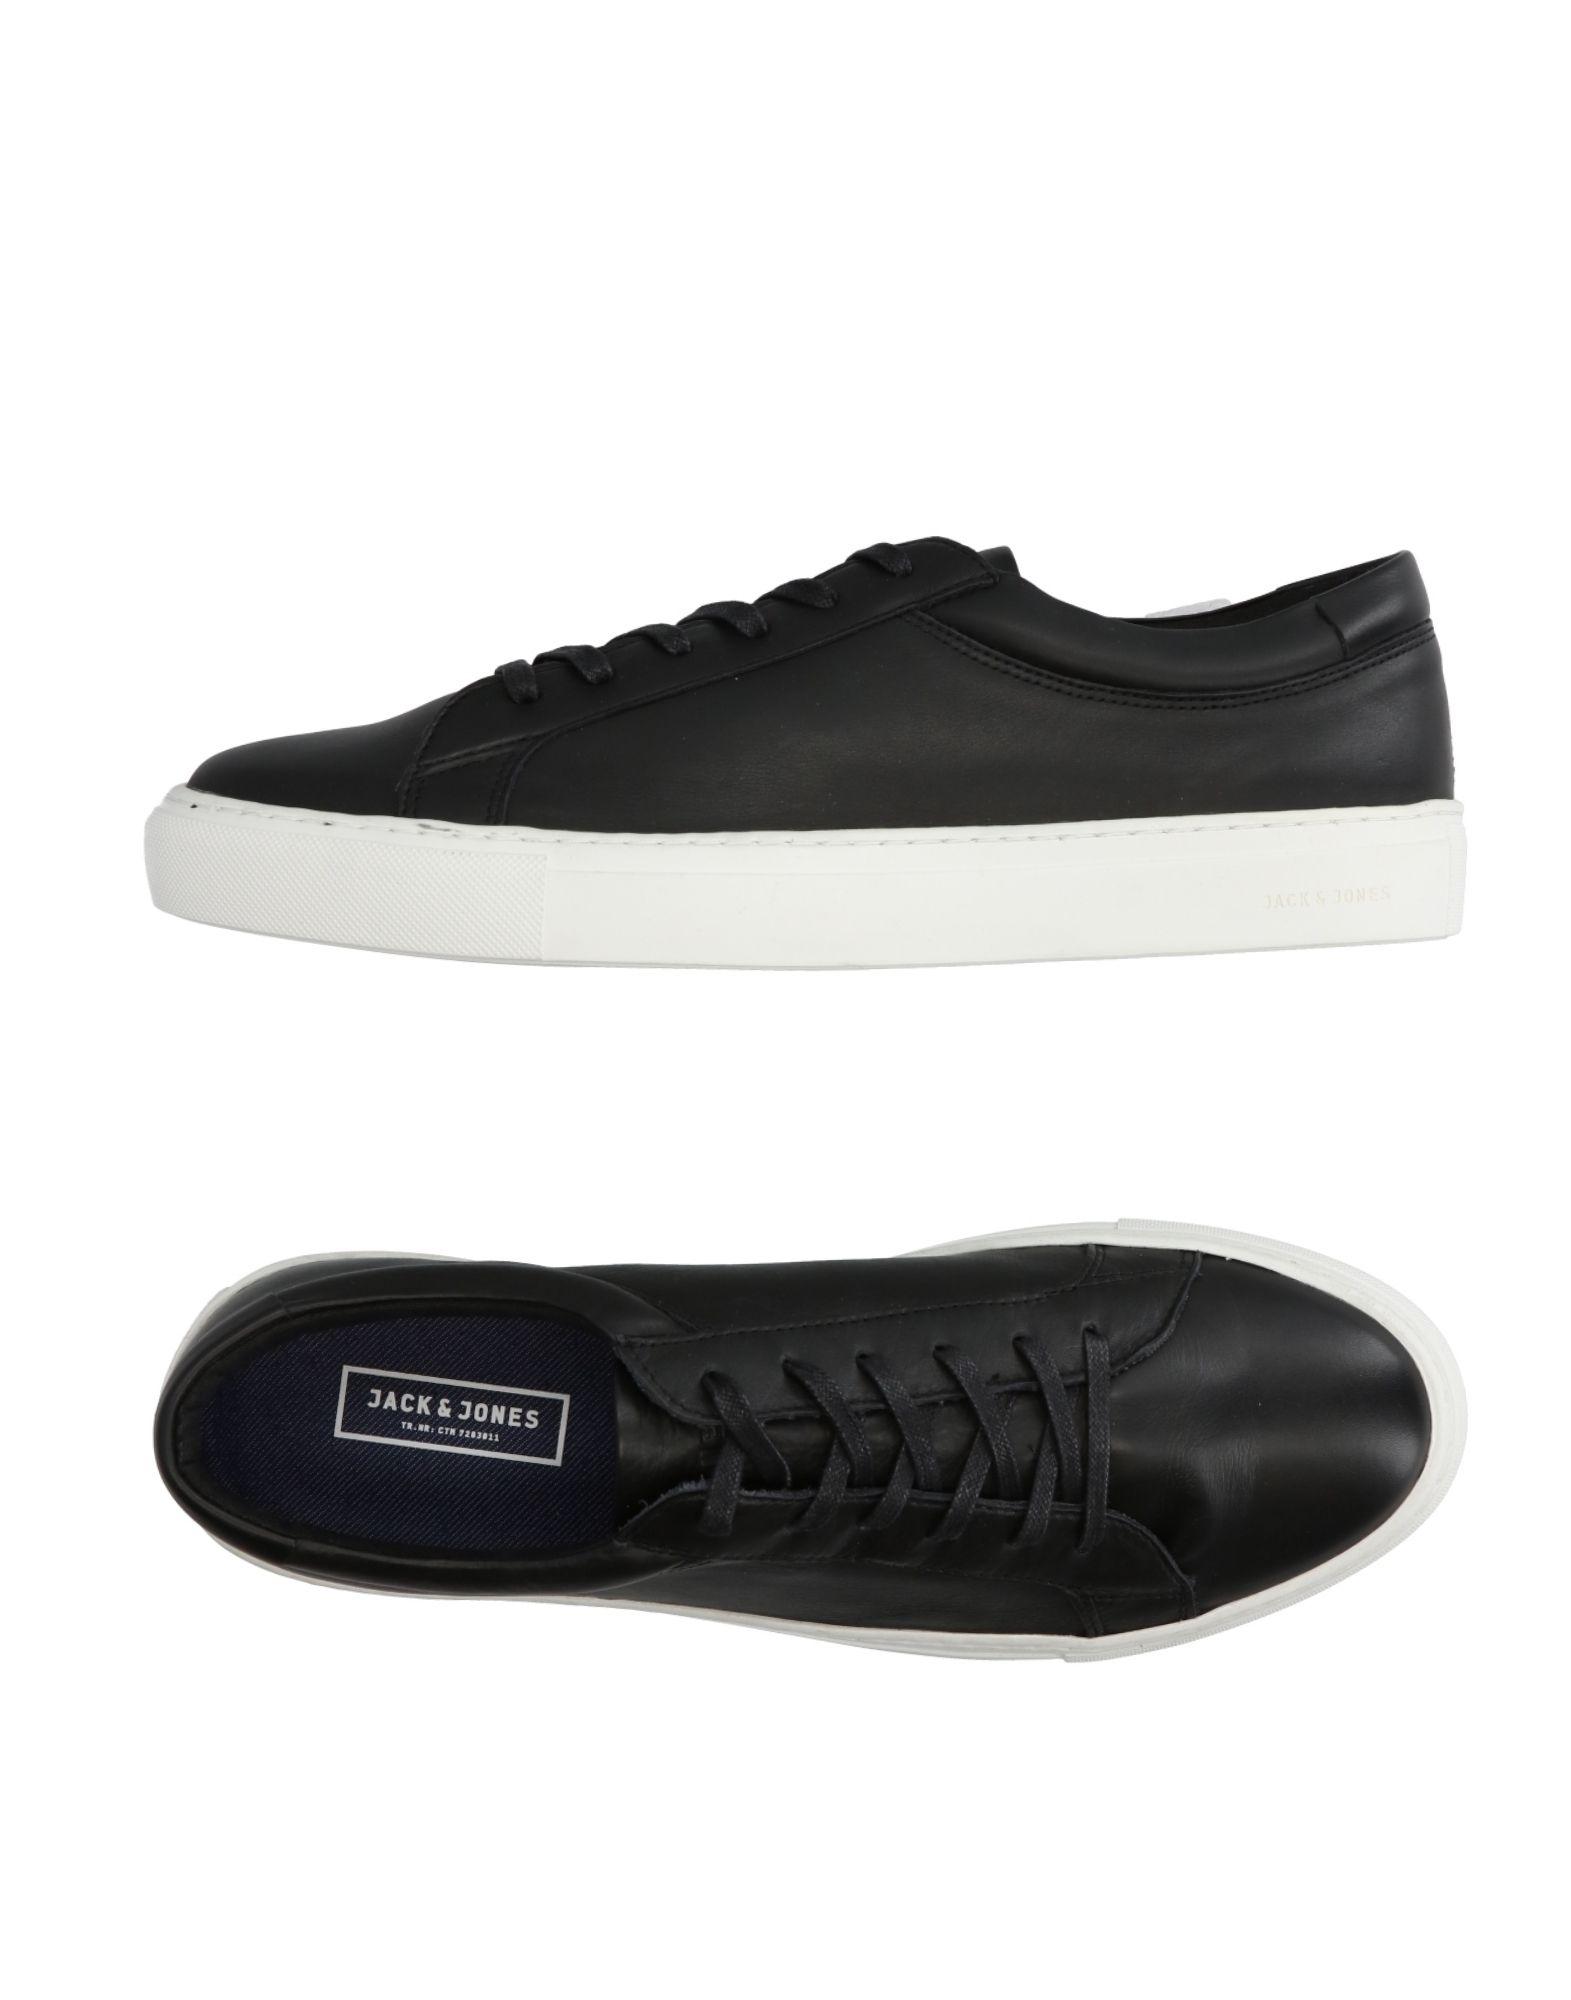 Rabatt echte Schuhe Jack & Jones Sneakers Herren  11287869AG 11287869AG  53e82d